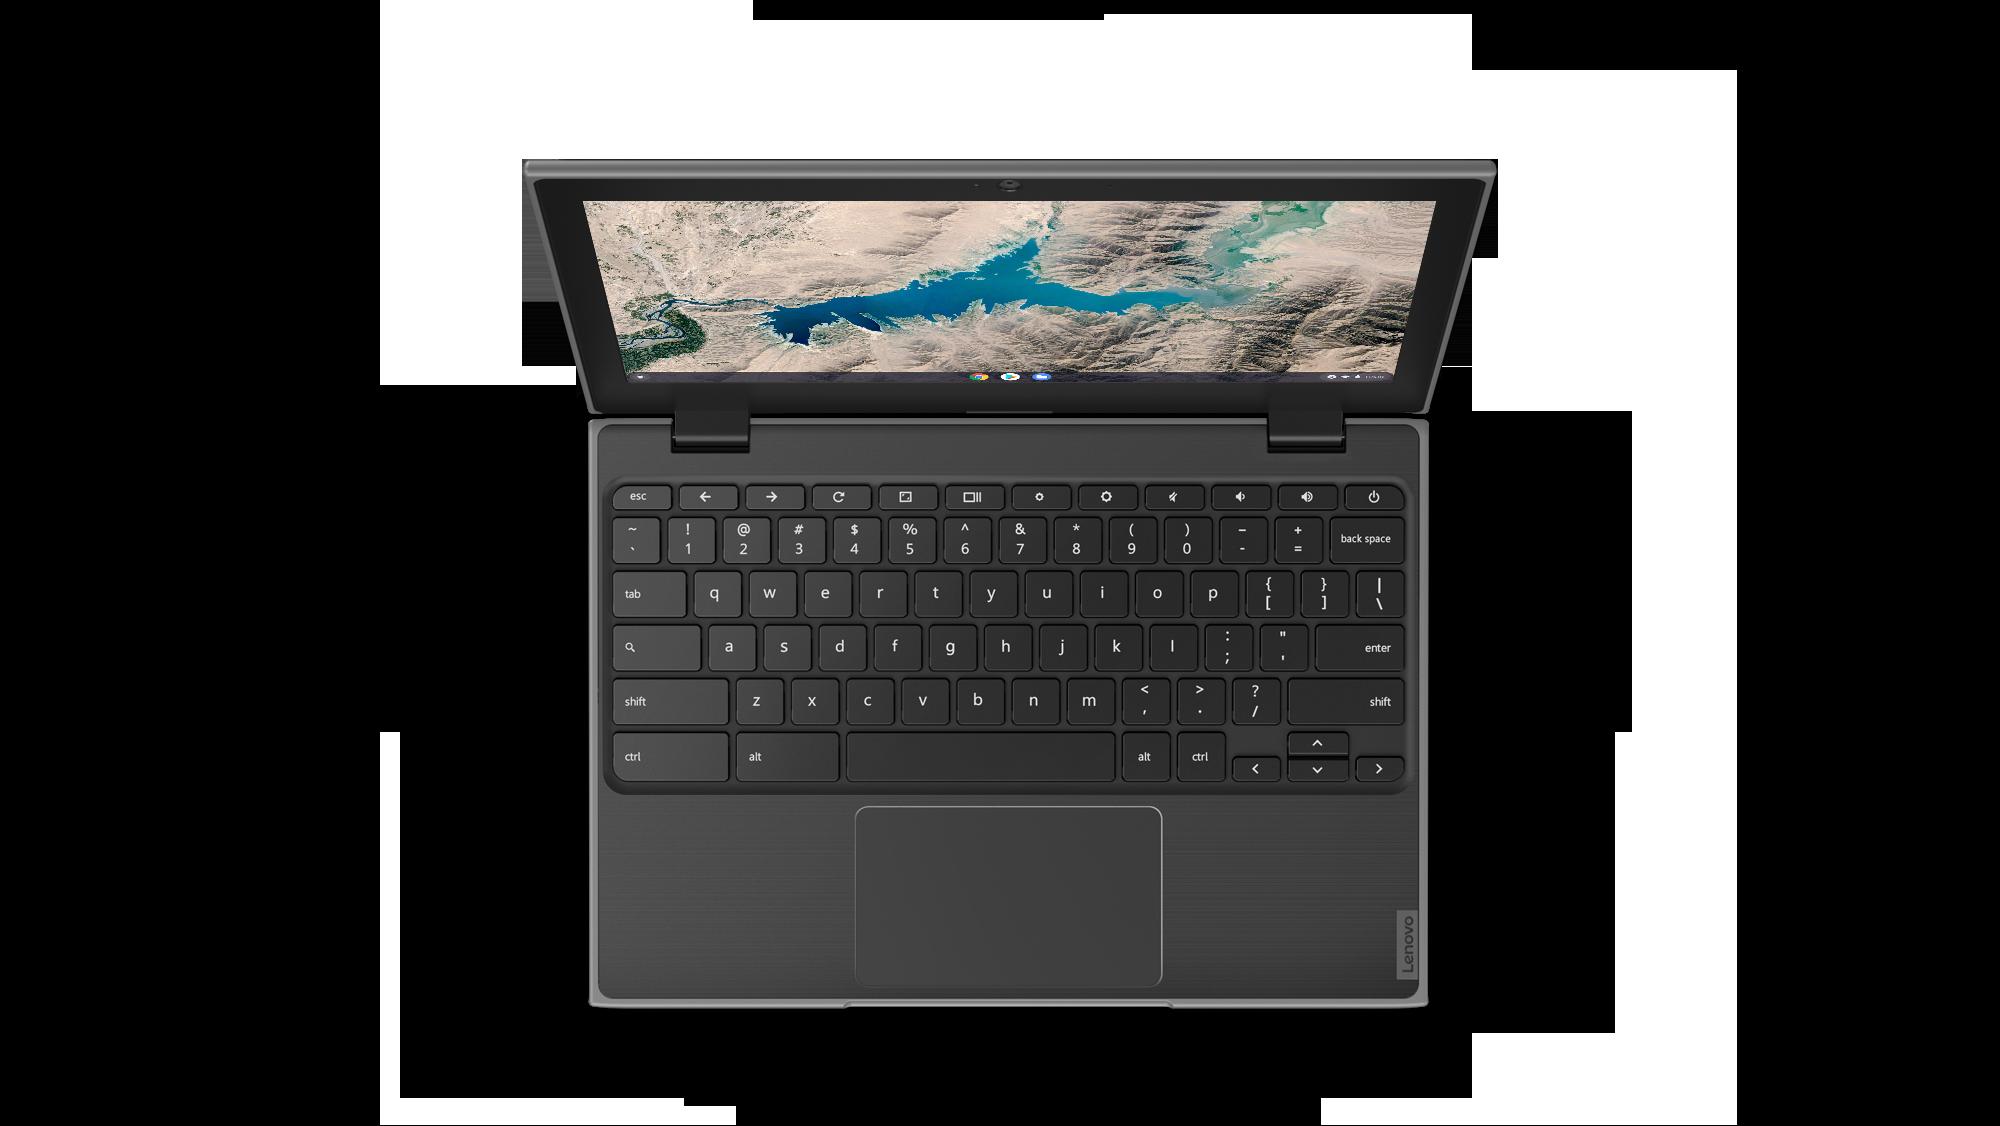 Lenovo 100e Chromebook 2nd Gen - photo 3